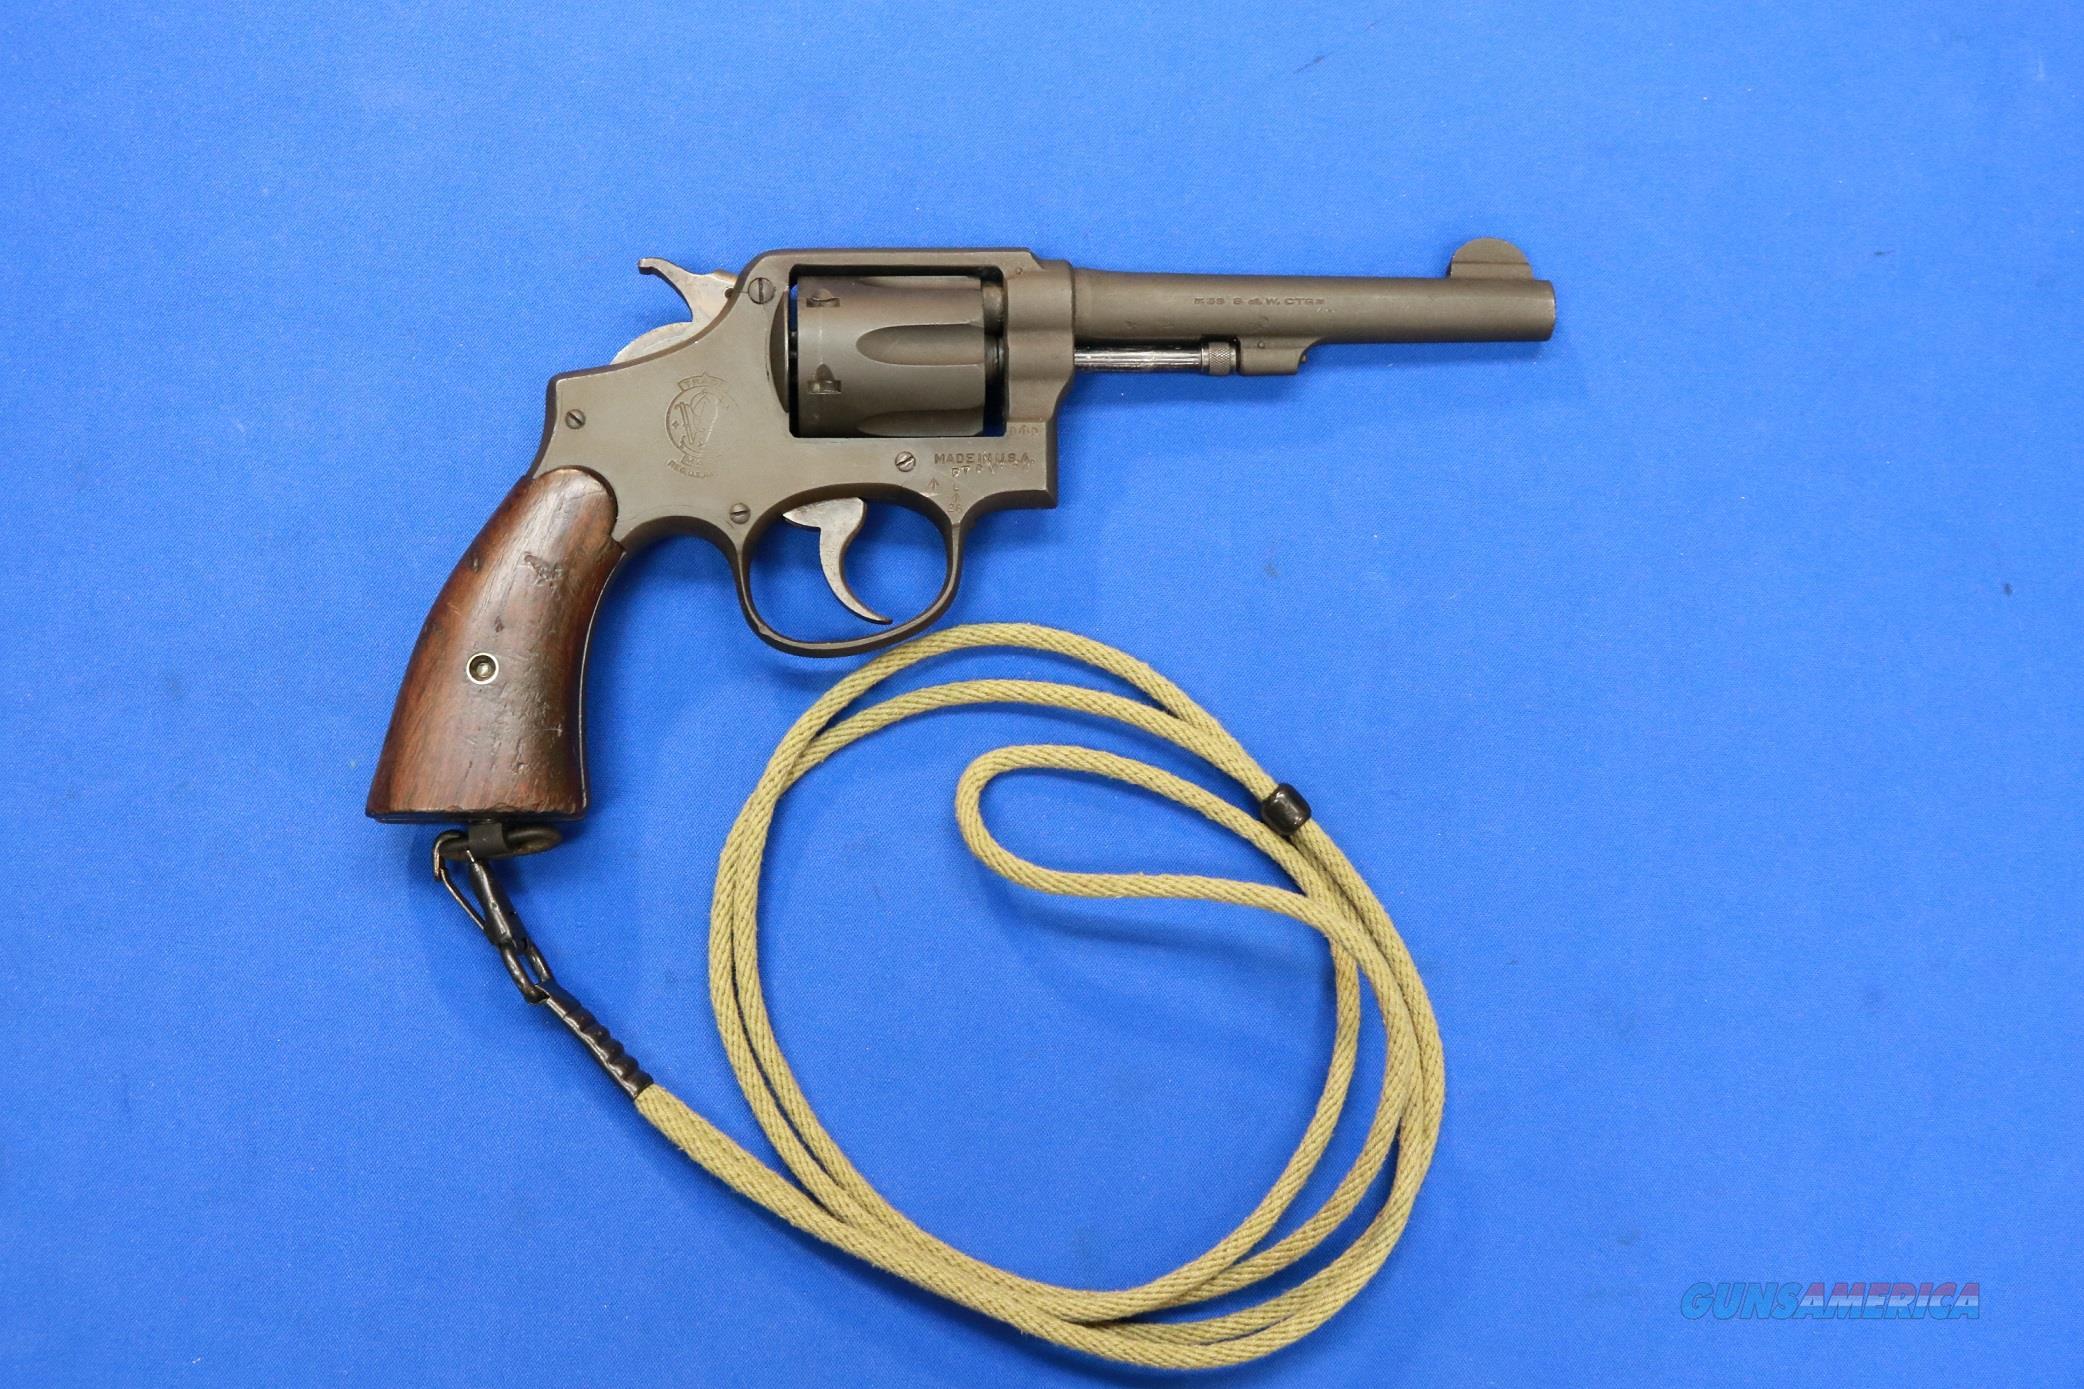 SMITH & WESSON .38/200 BRITISH SERVICE LEND LEASE   Guns > Pistols > Smith & Wesson Revolvers > Pre-1945